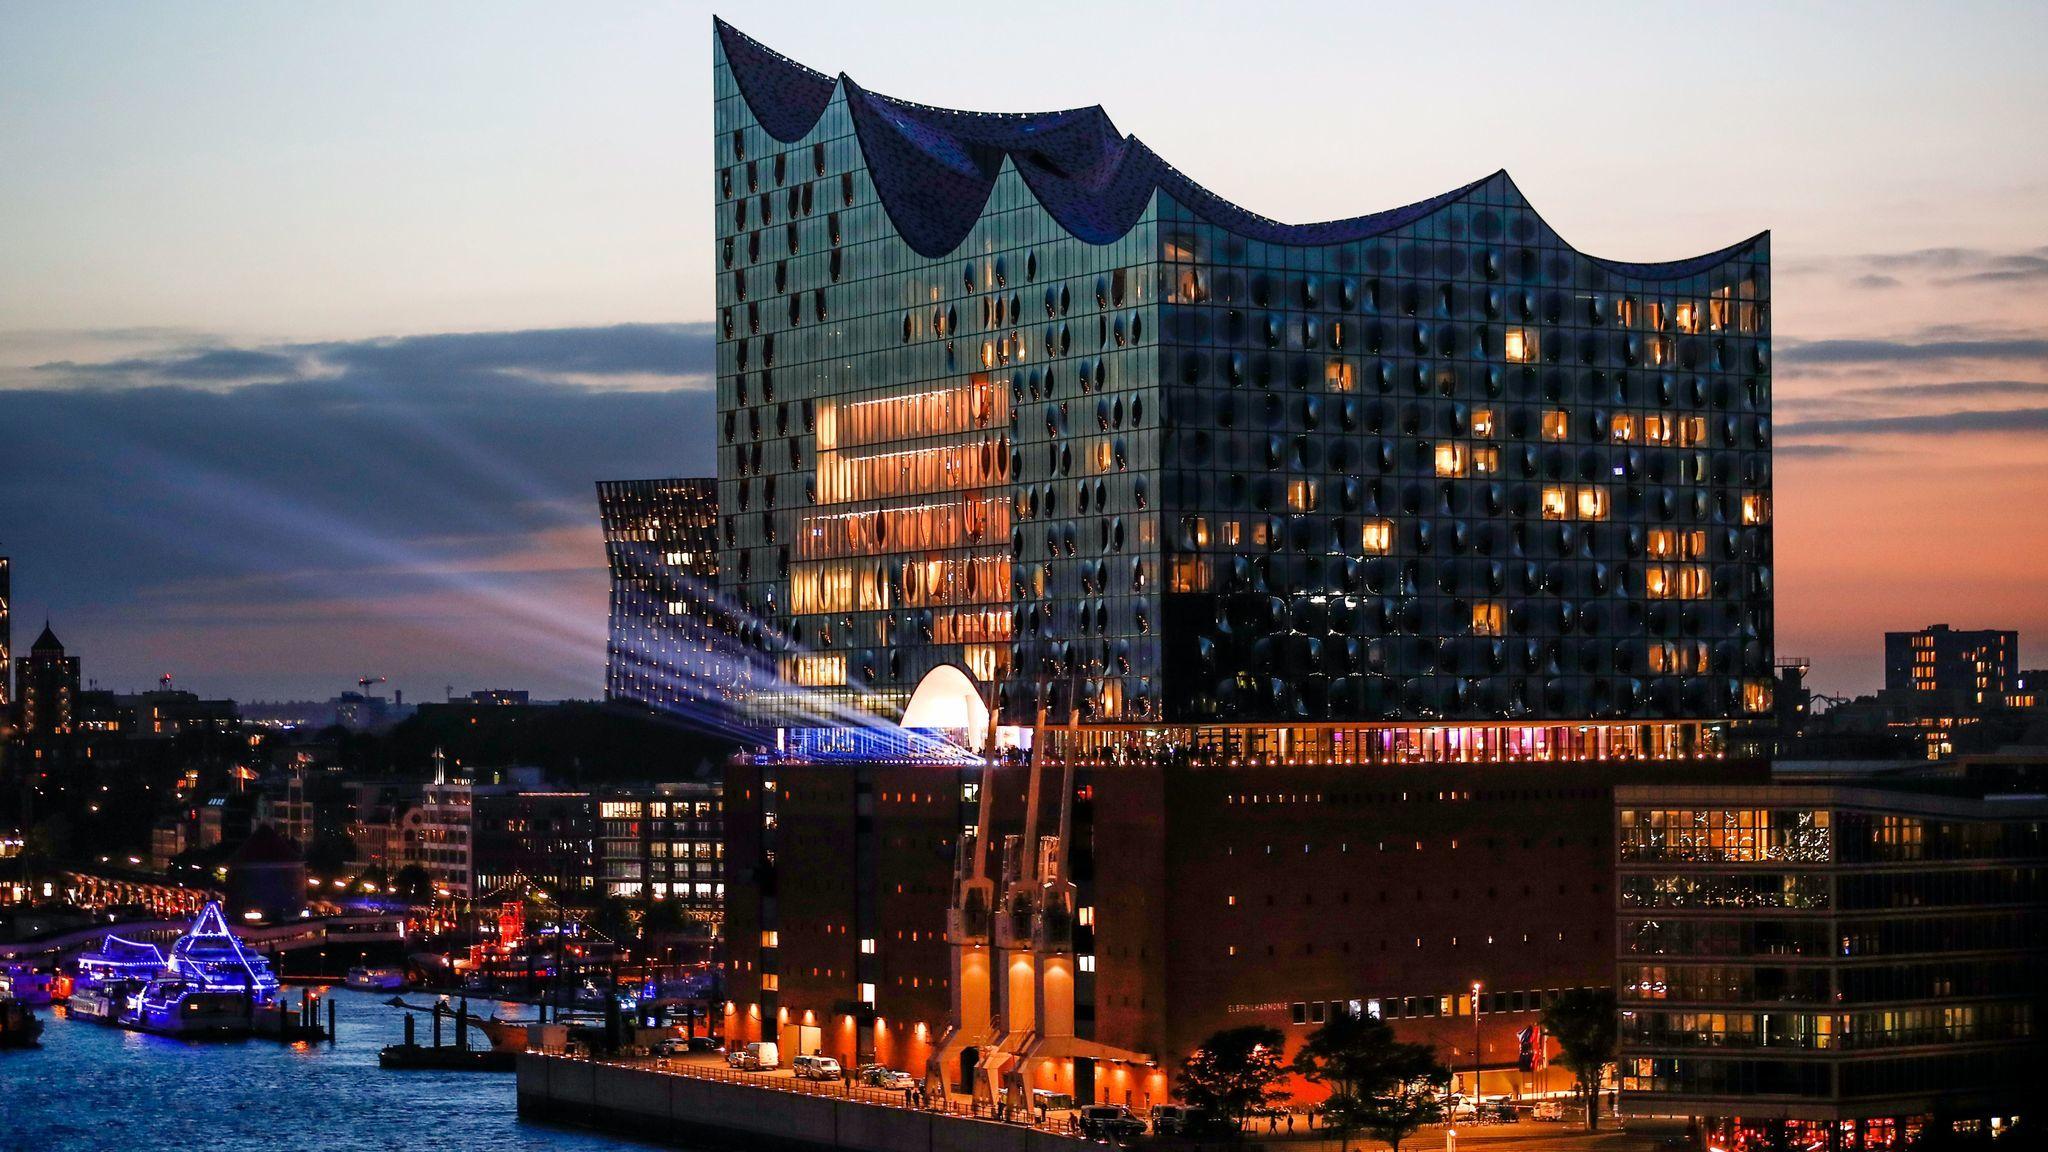 The Elbphilharmonie concert hall in Hamburg, Germany. (Franziska Krug / Getty Images)